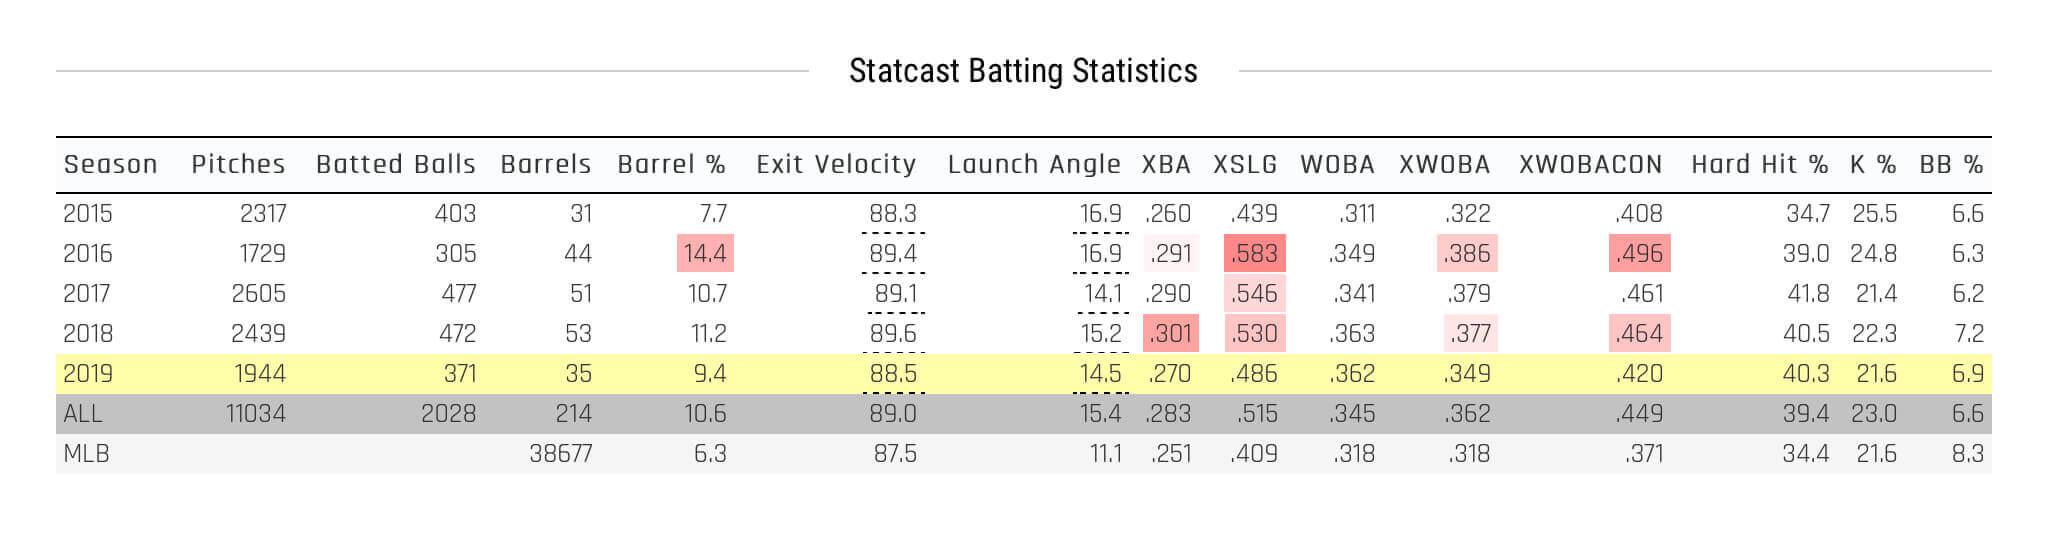 More Statcast data